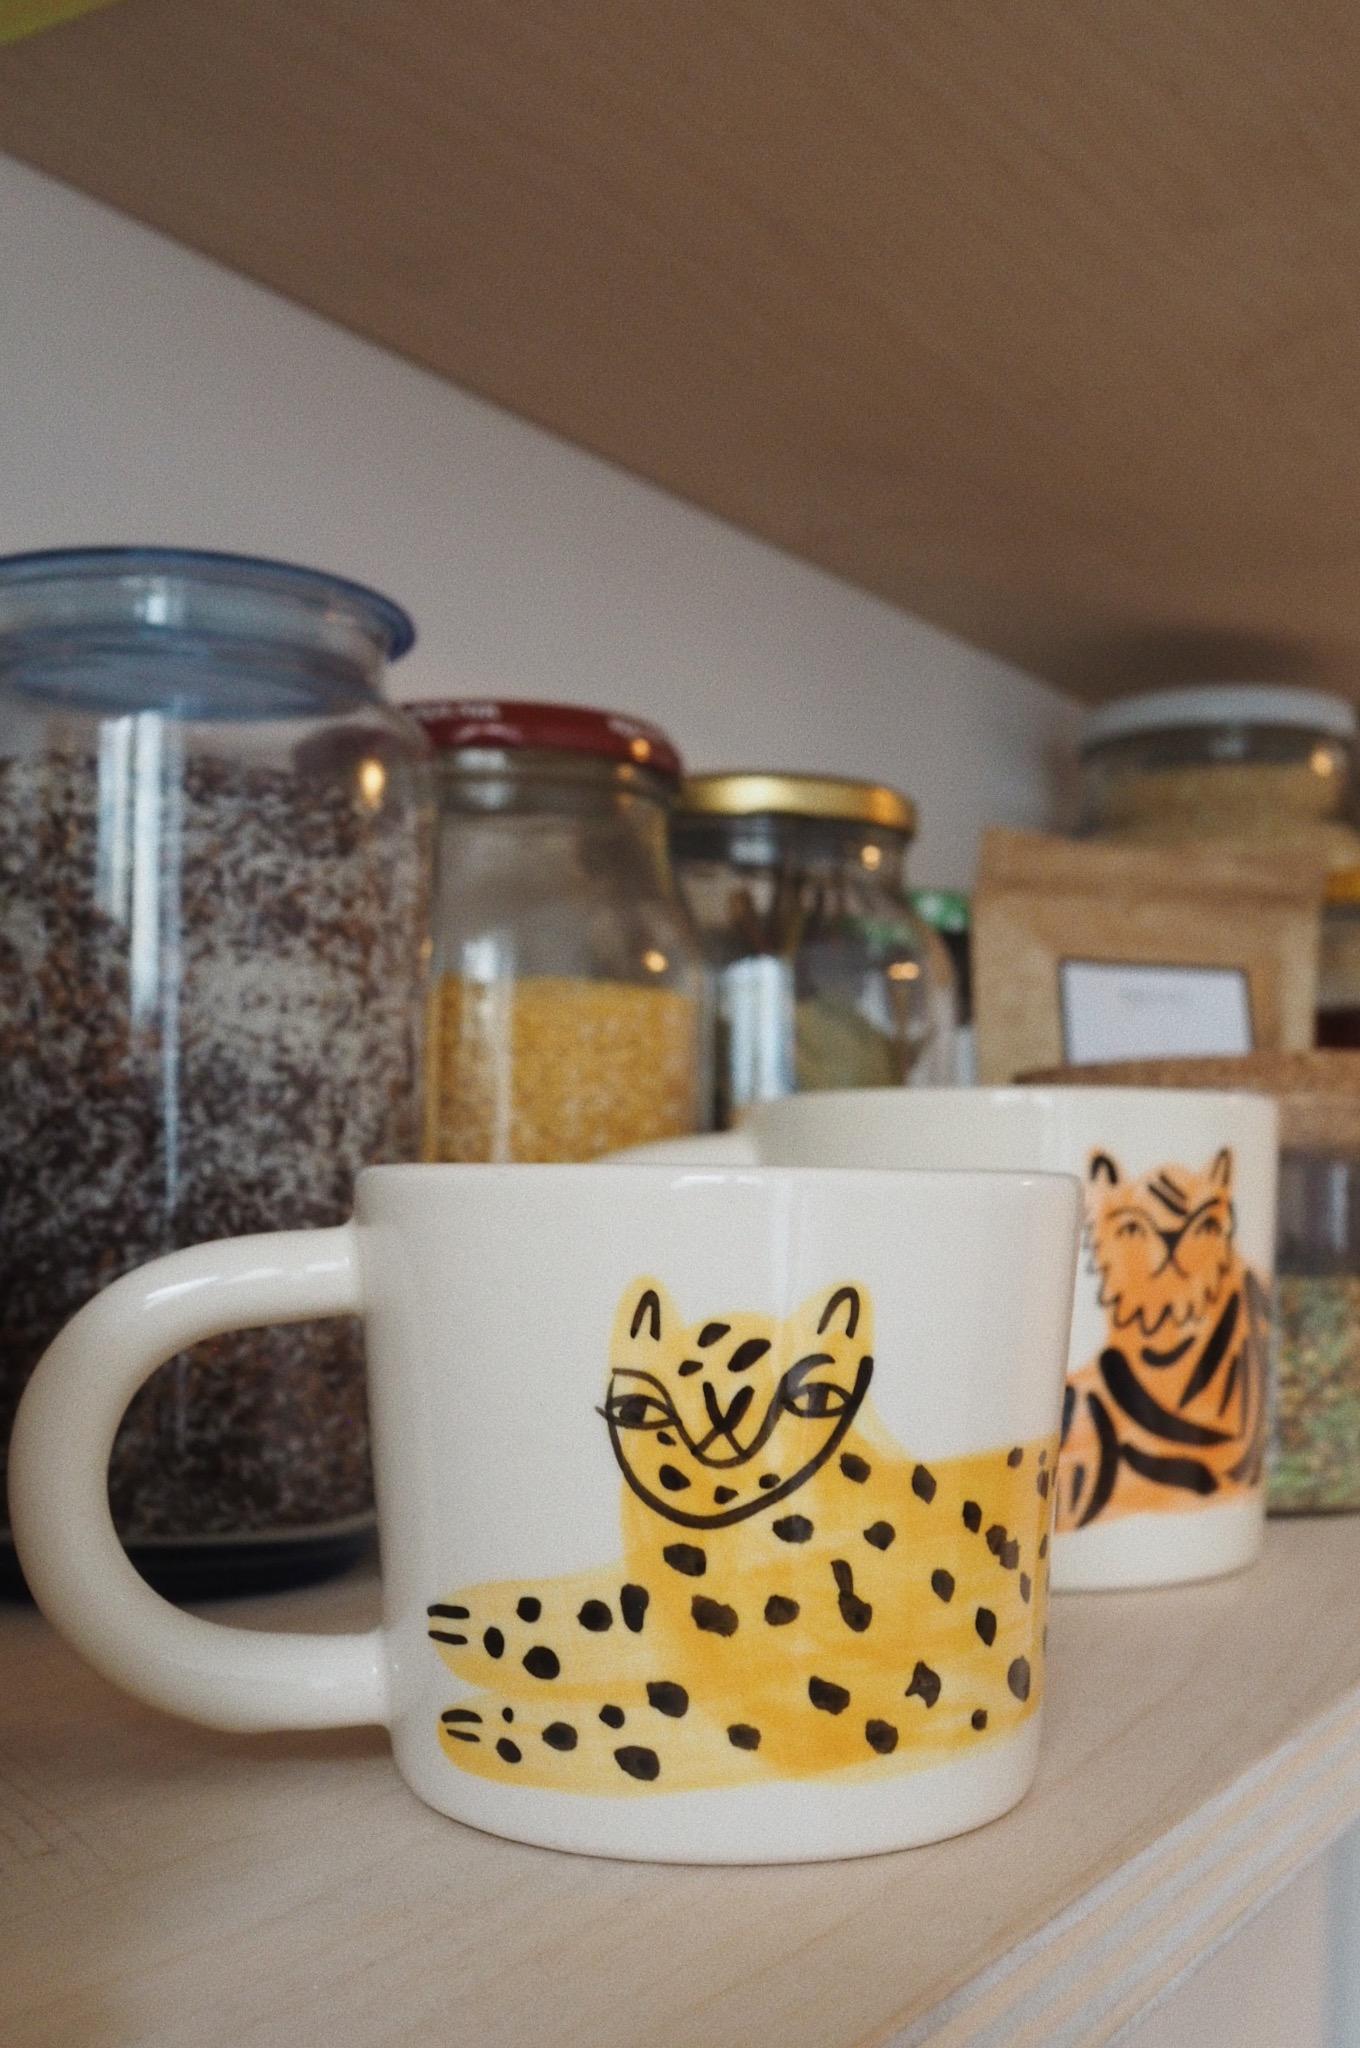 TRZASK ceramika kubki z dzikimi kotami